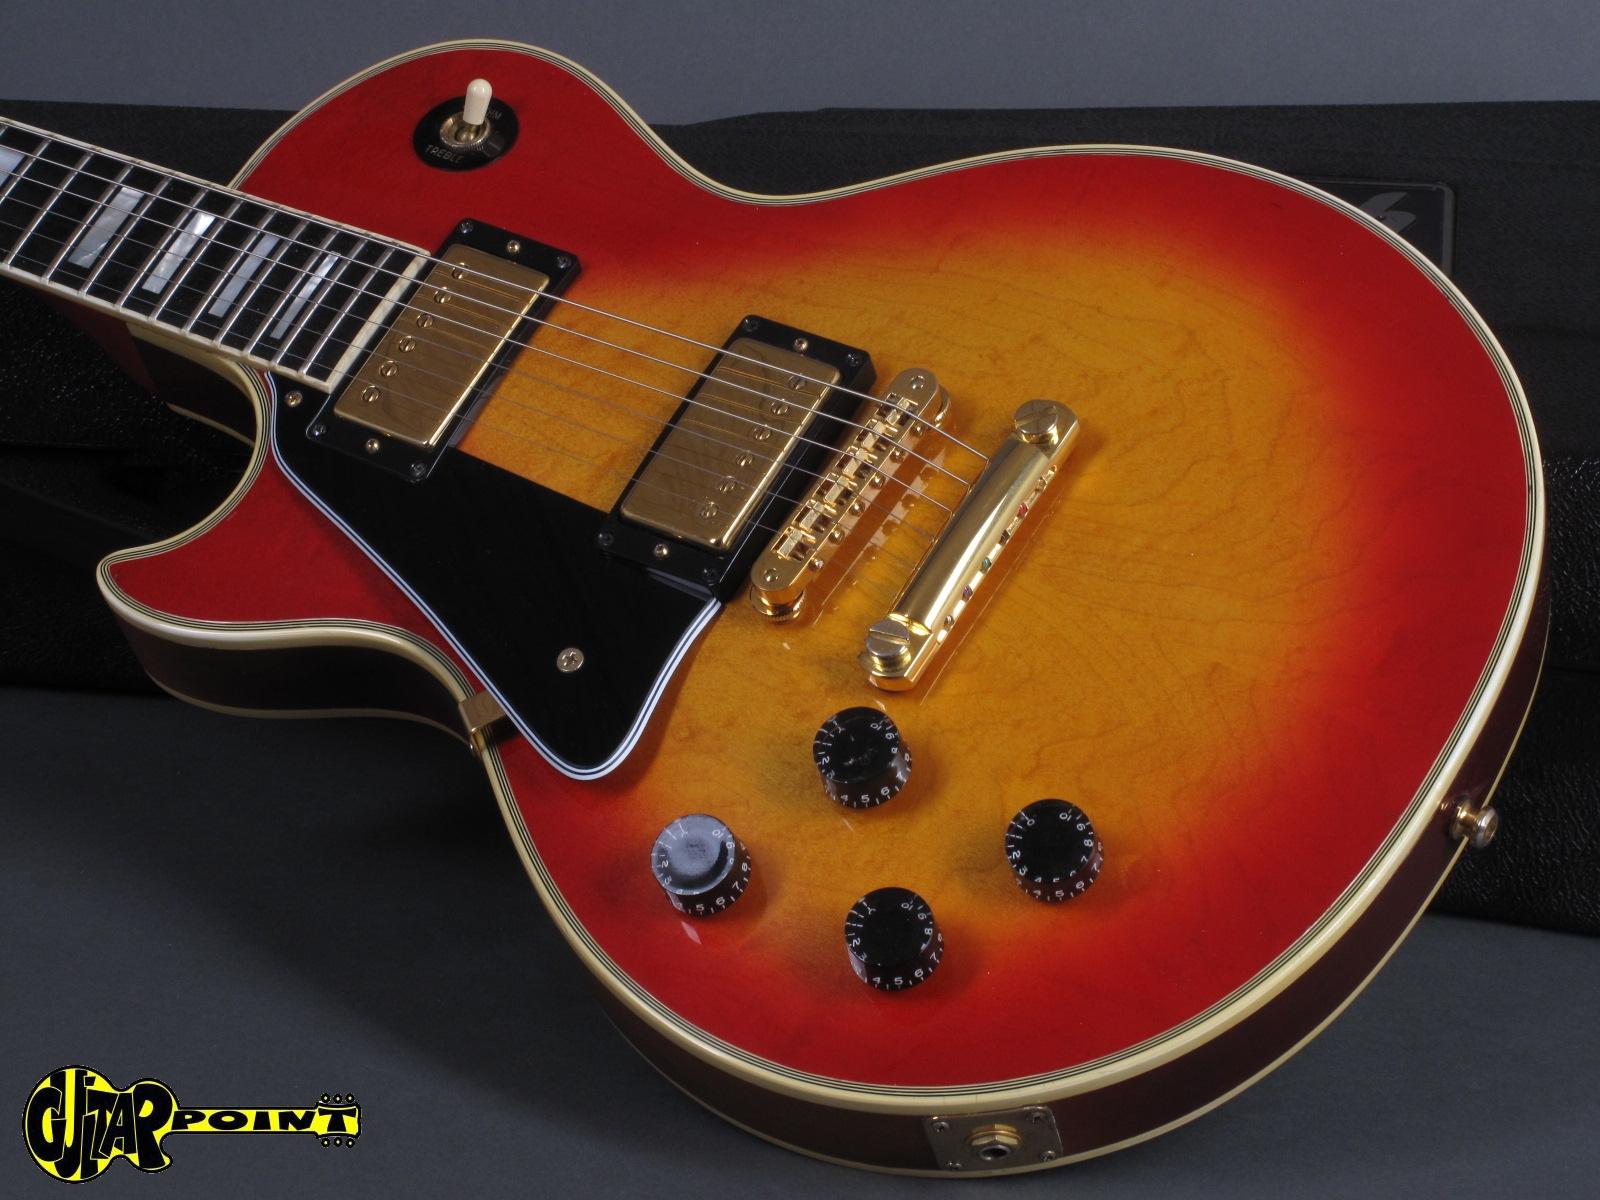 https://guitarpoint.de/app/uploads/products/1981-gibson-les-paul-custom-cherry-sunburst-lefty/Gibson81LPCstCSB82571001L_25.jpg